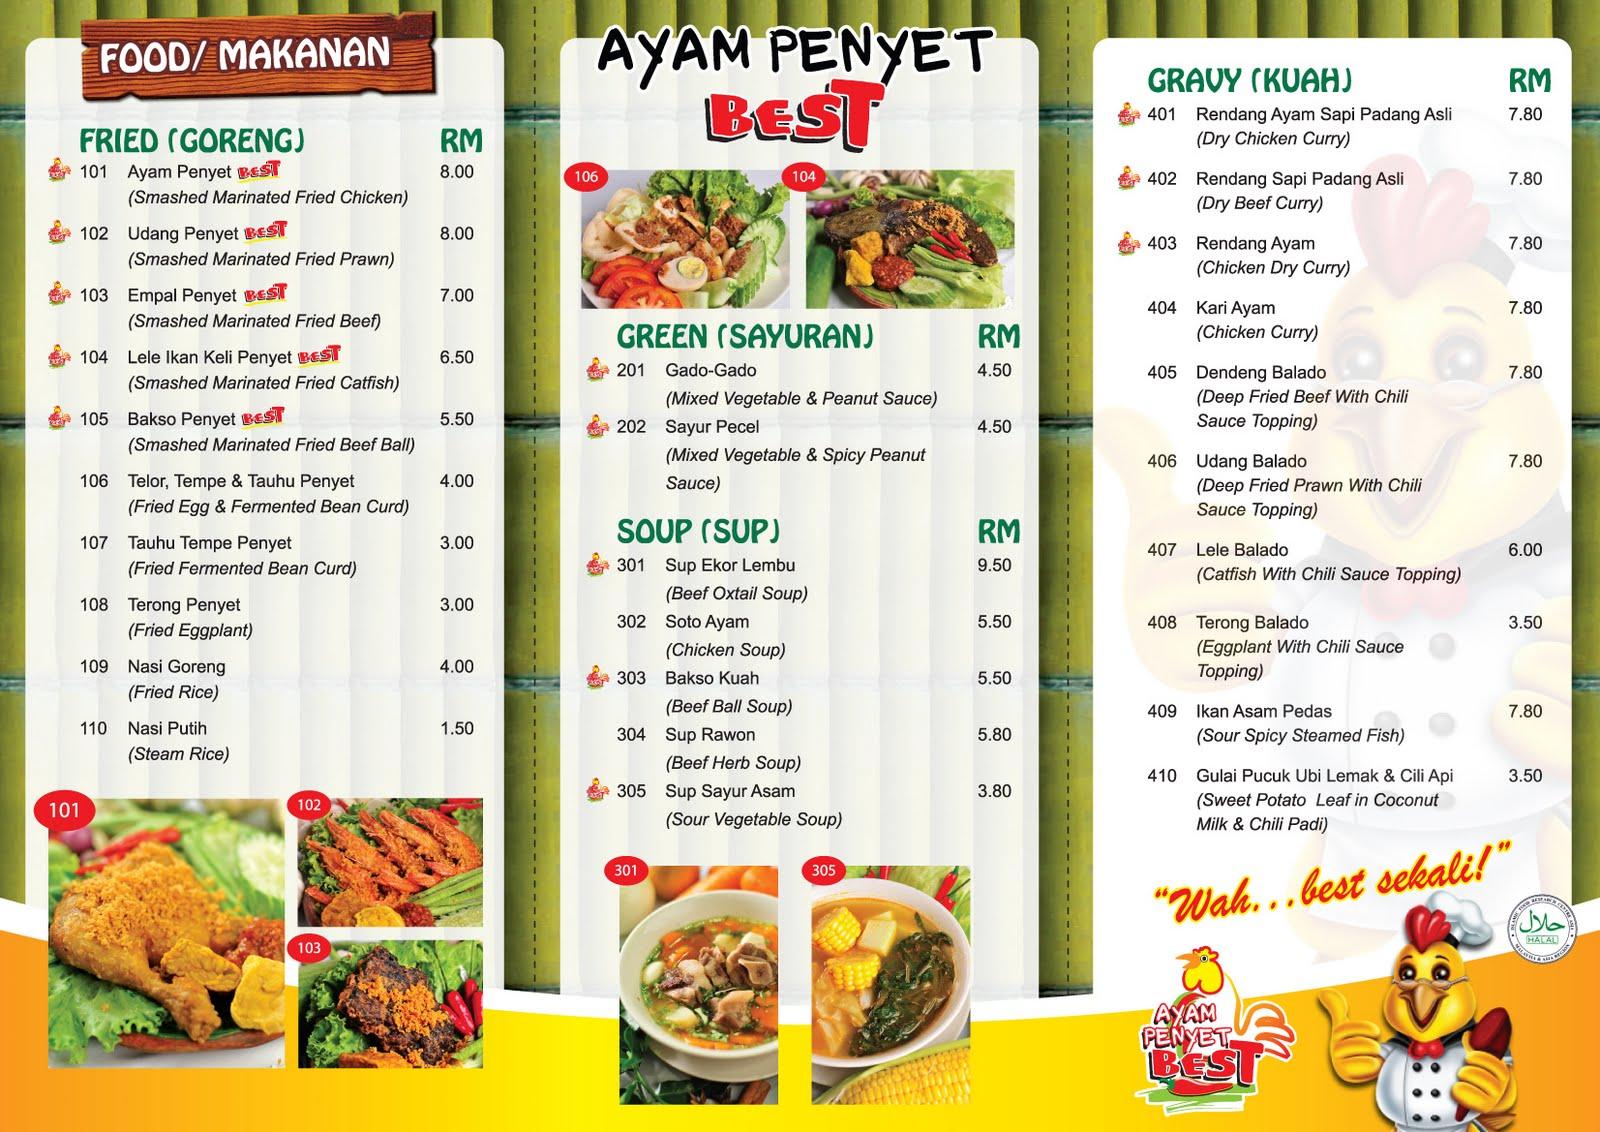 Vincianart ayam penyet best restaurant branding